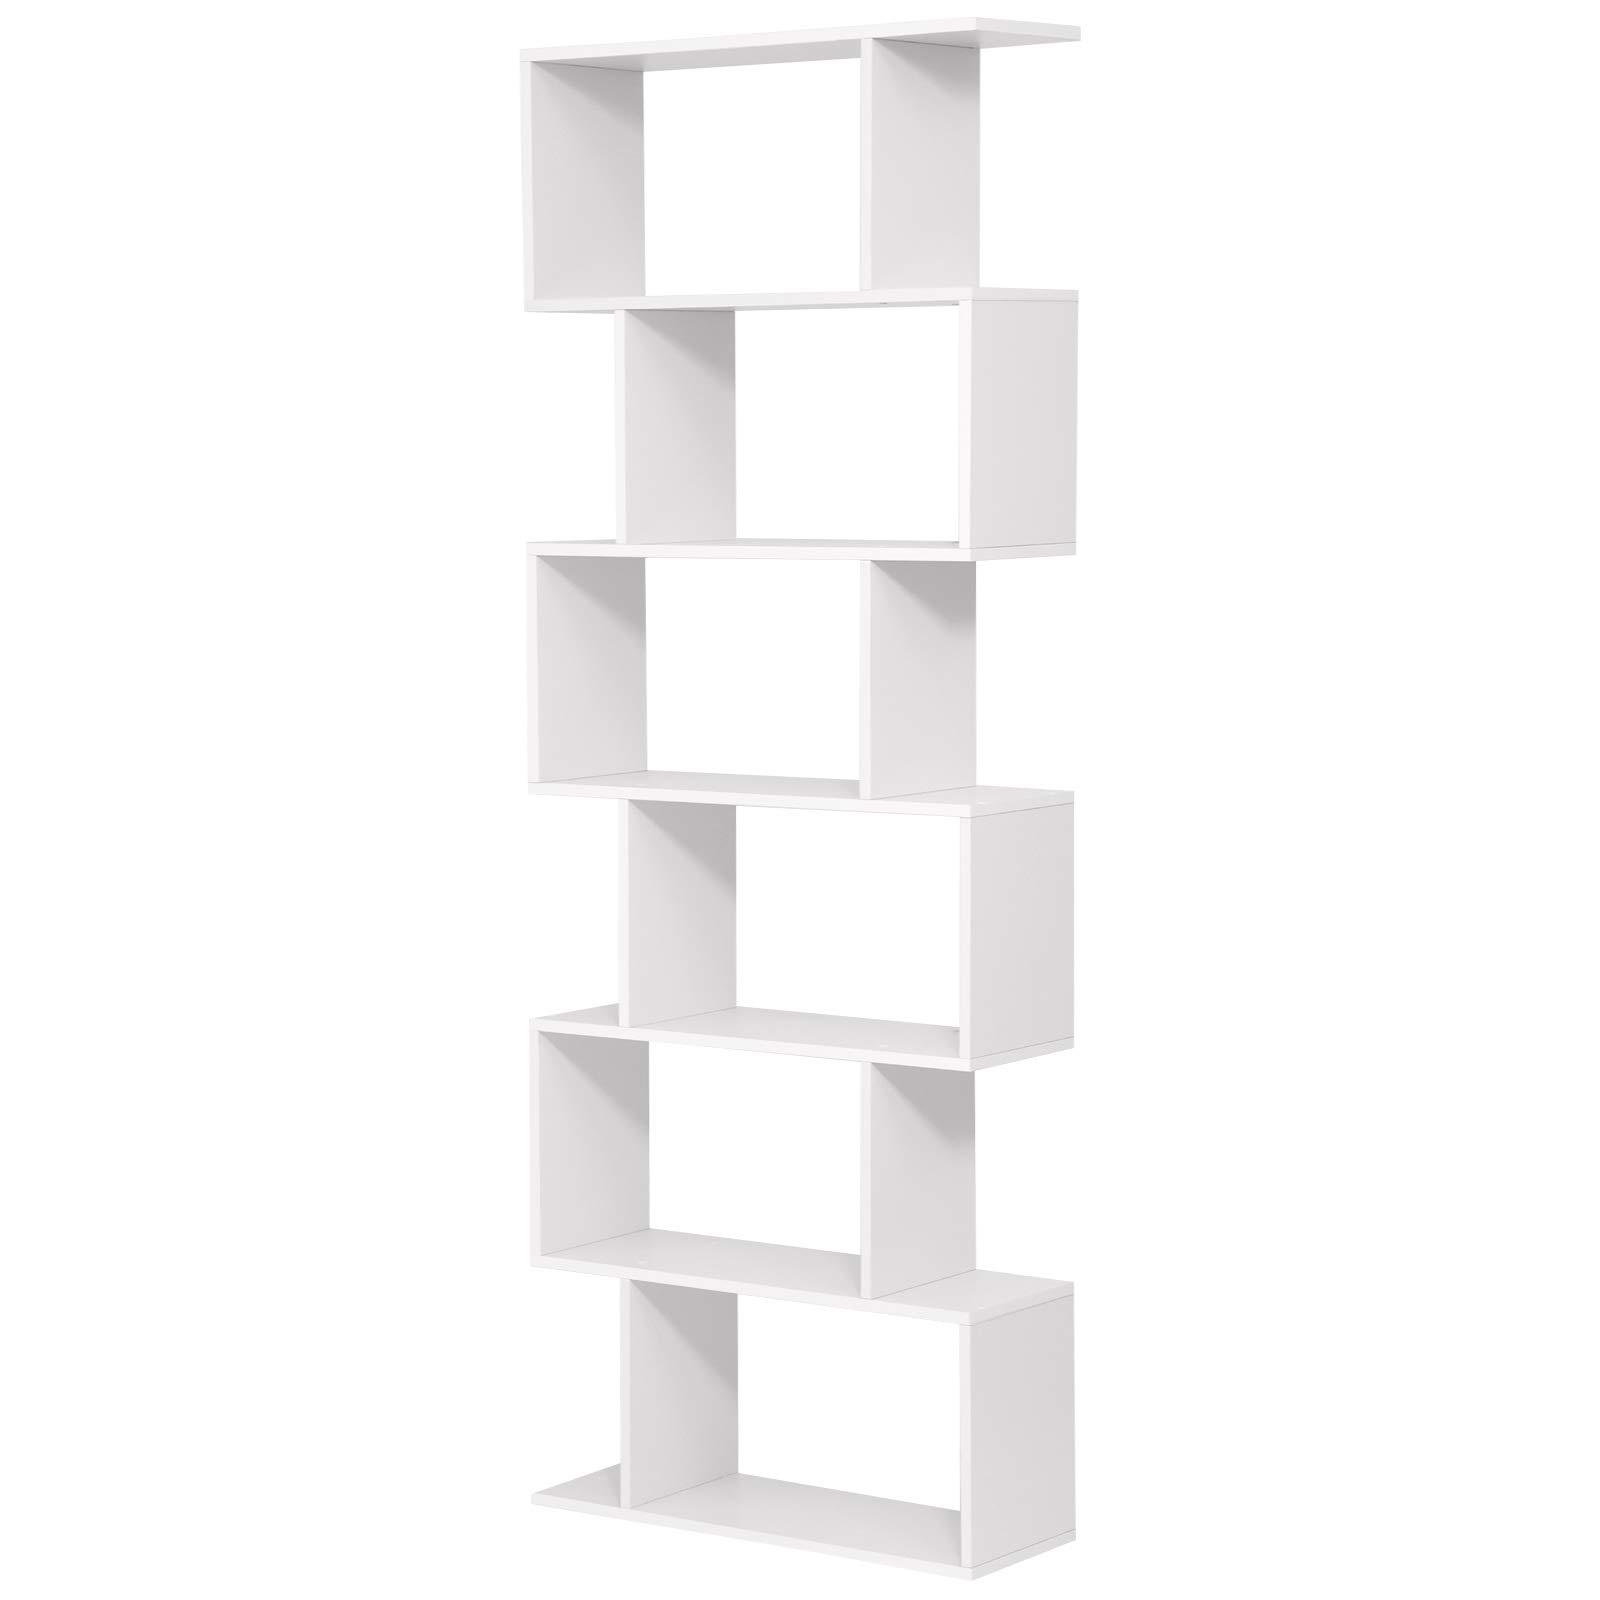 VASAGLE Wooden Bookcase, Cube Display Shelf and Room Divider, 6-Tier Bookshelf, Freestanding Shelving Unit, White LBC61WT